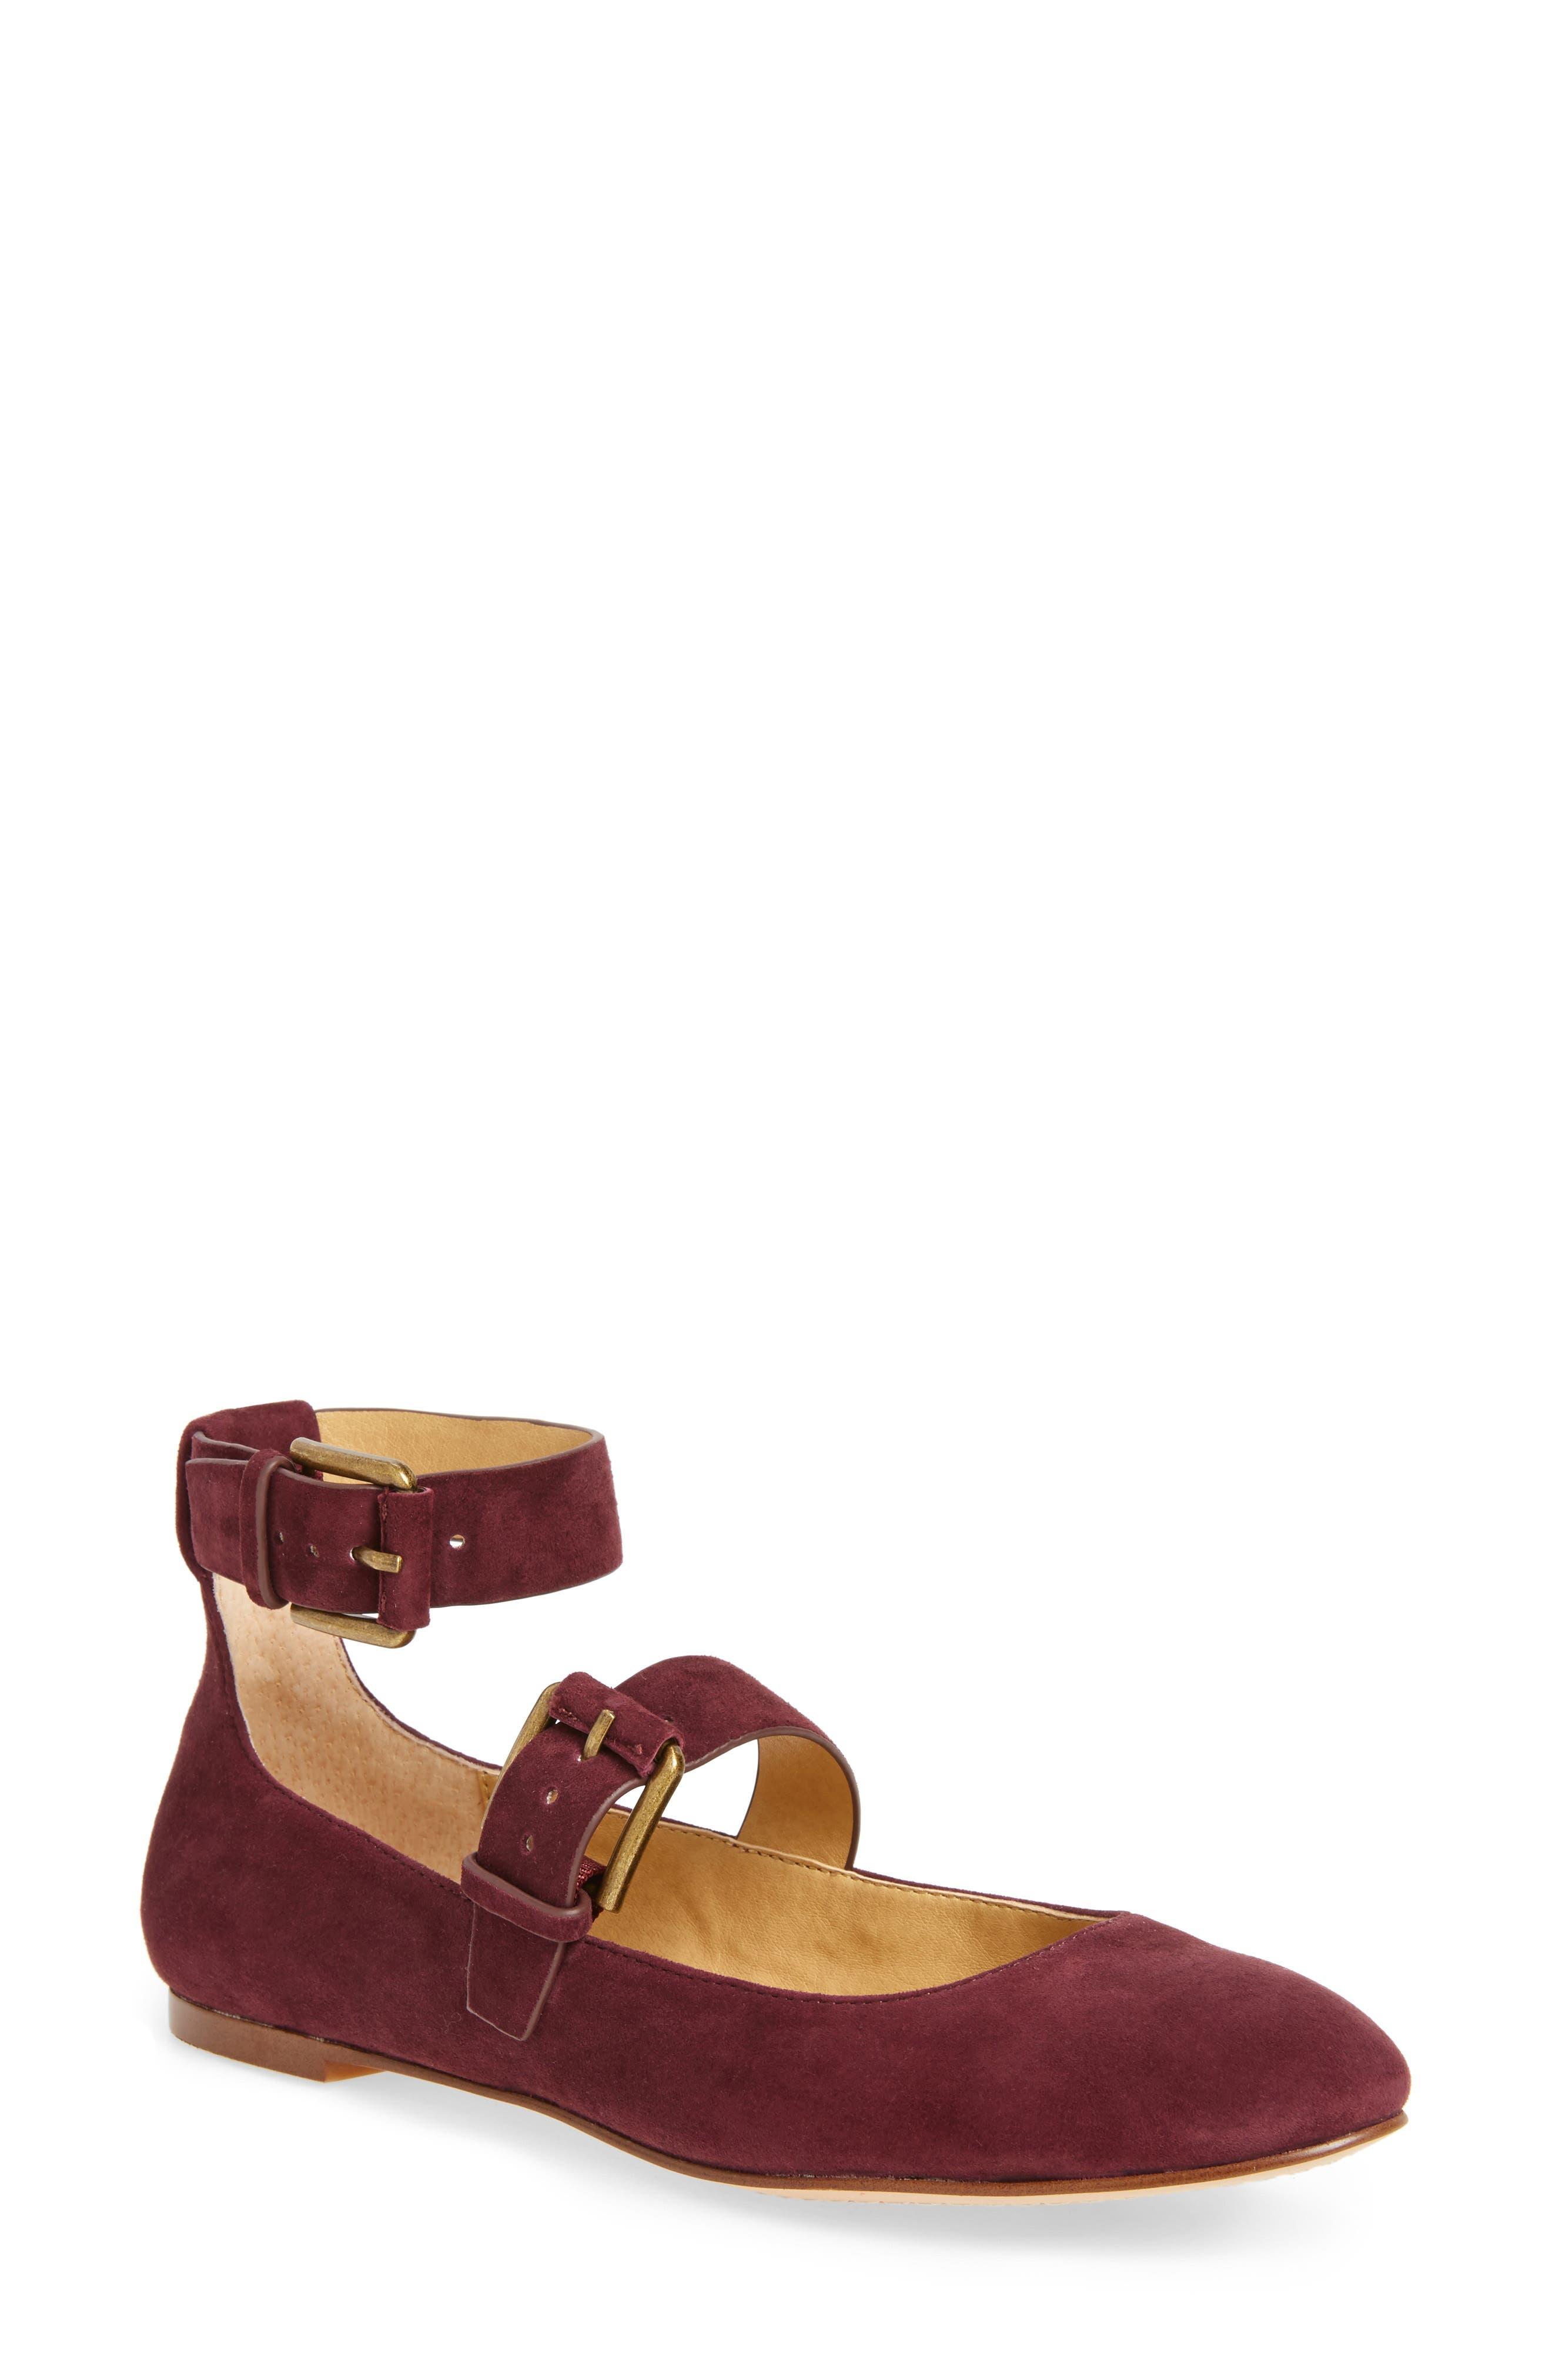 Splendid Dalenna Ankle Strap Ballet Flat